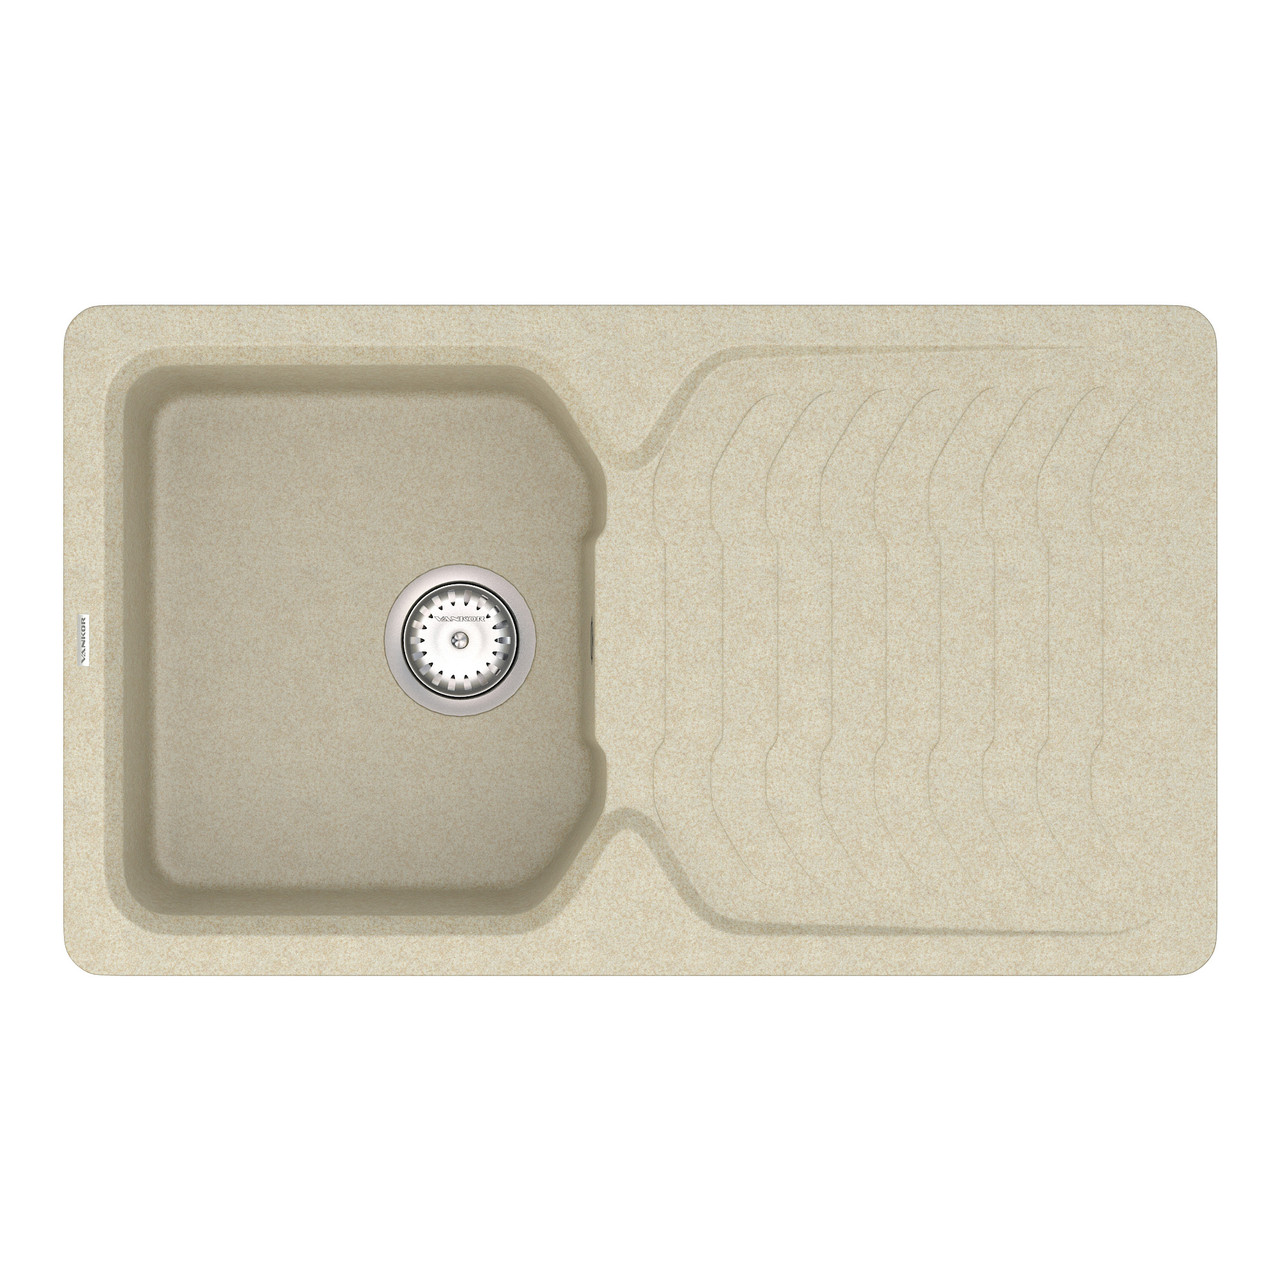 Кухонна мийка кварц 50*85 см VANKOR Sigma SMP 02.85 Beige